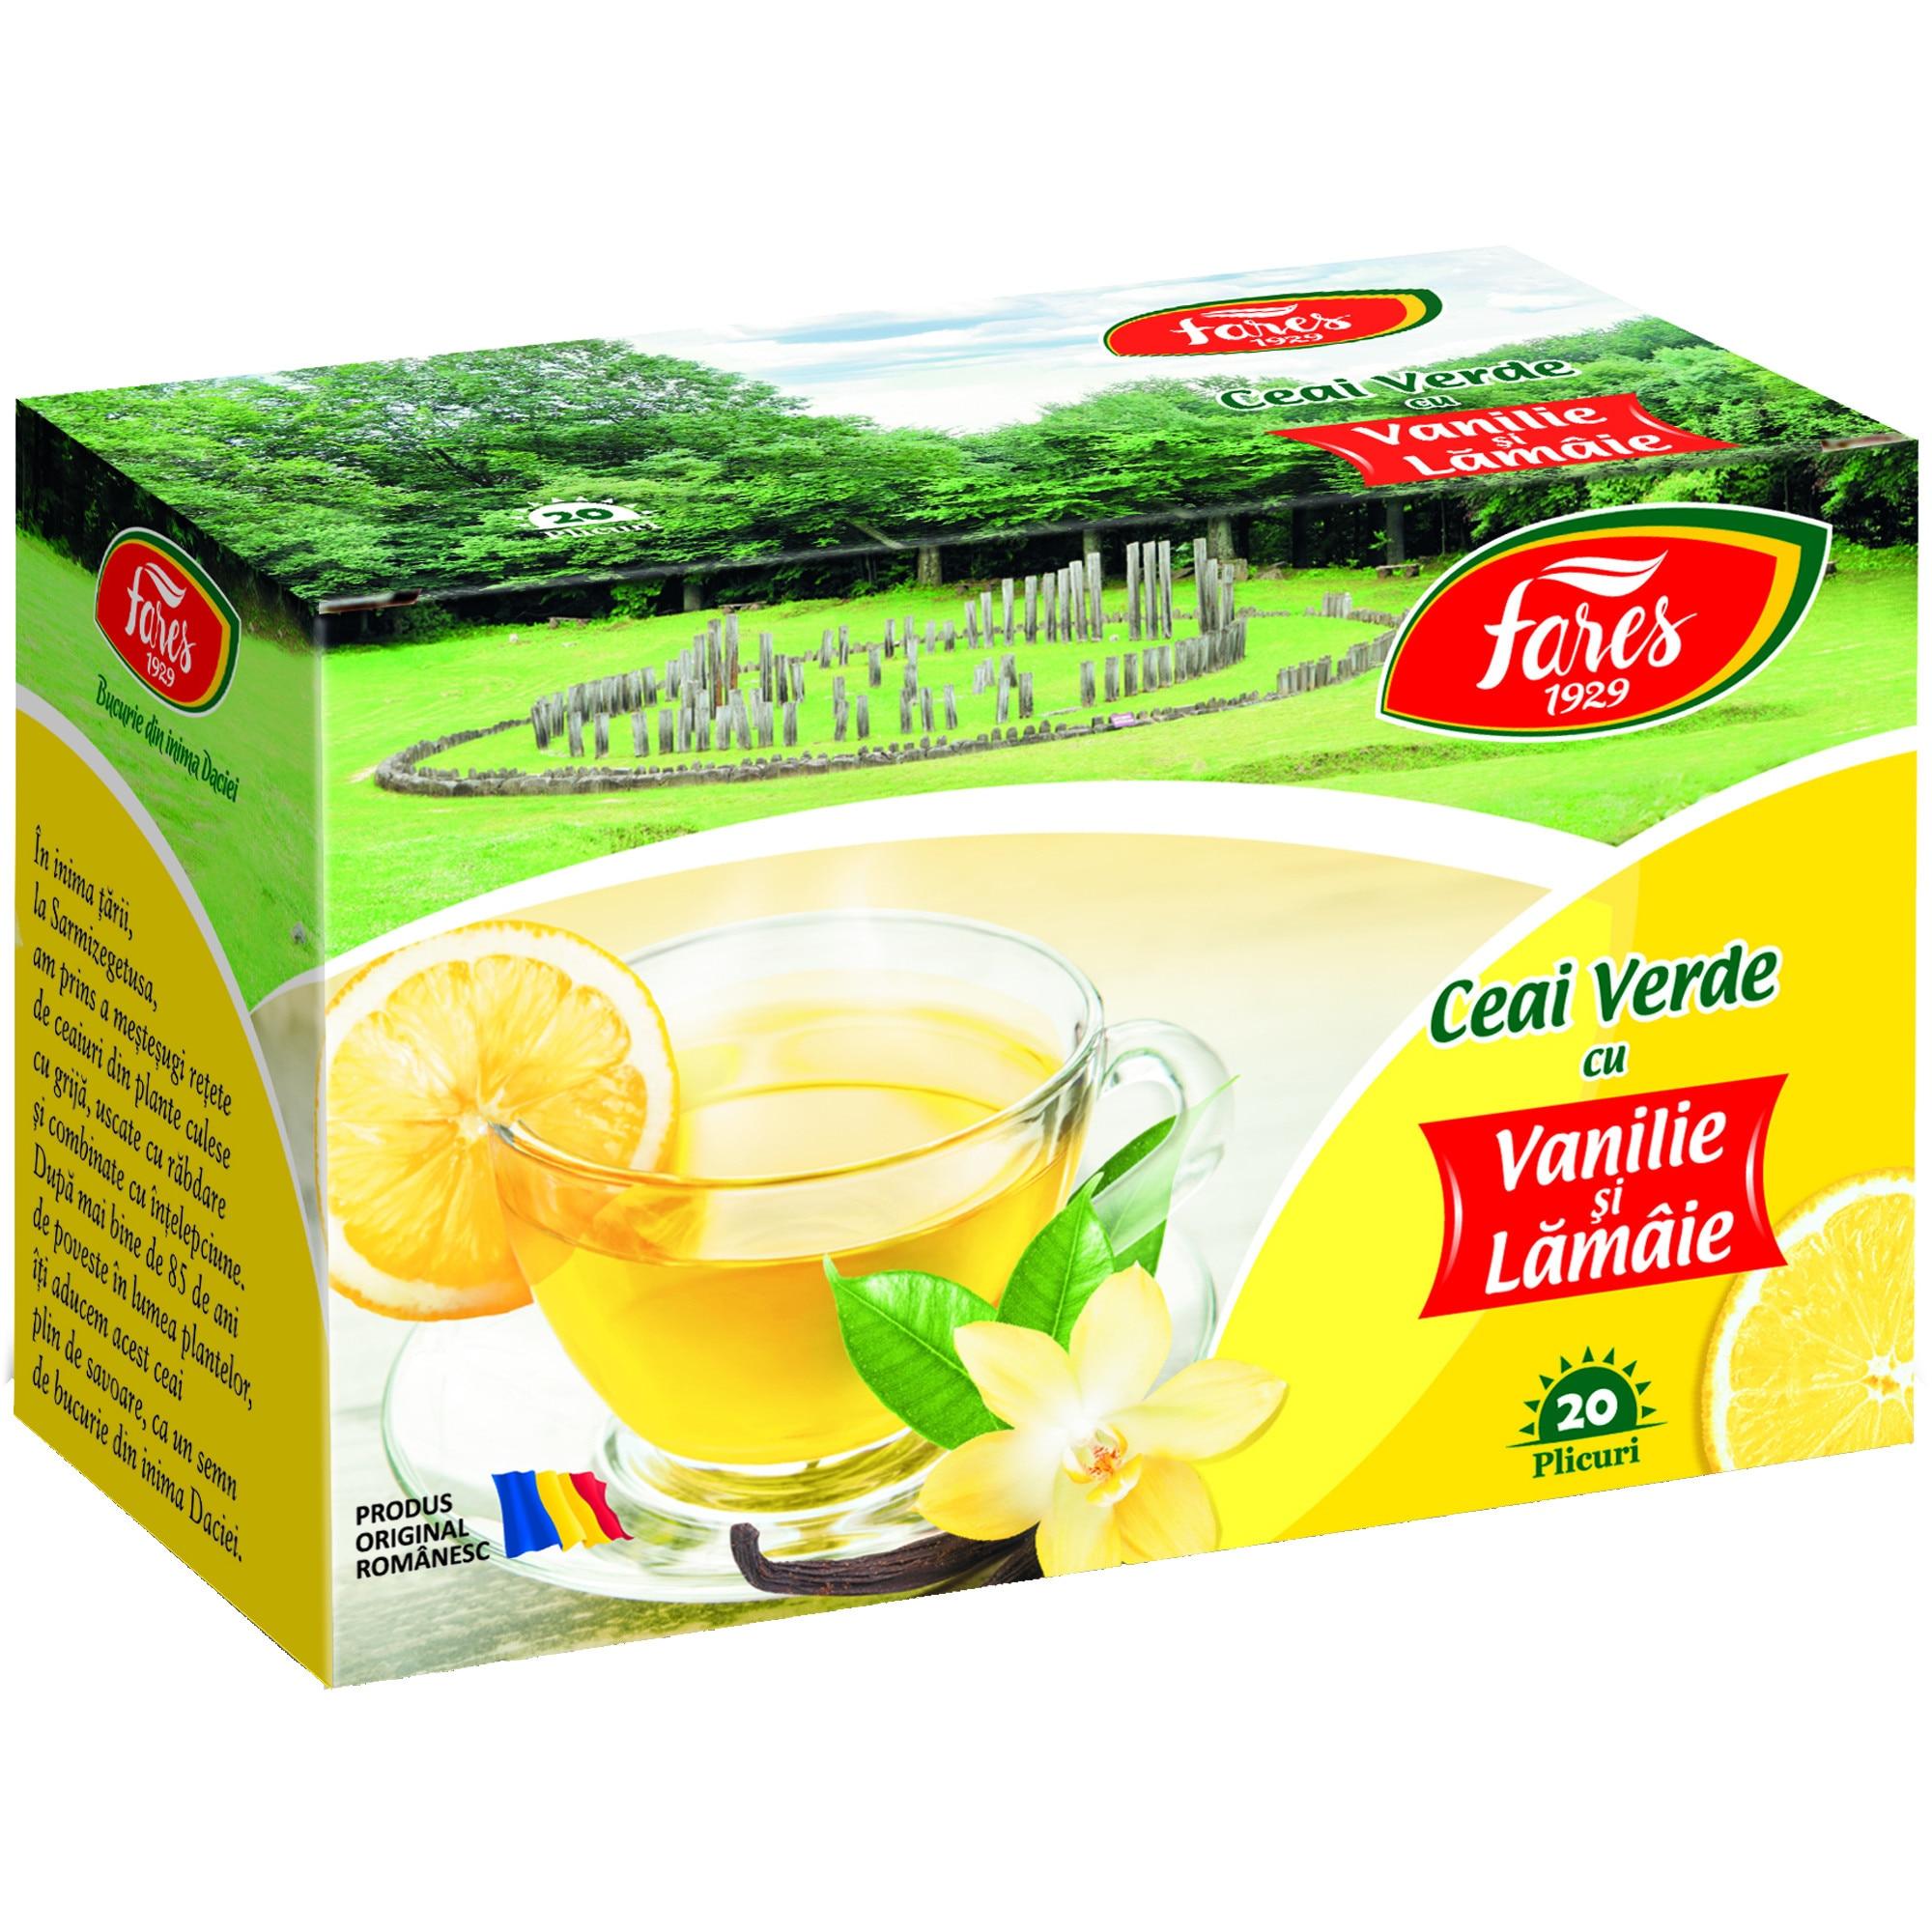 ceai verde cu lamaie dimineata)